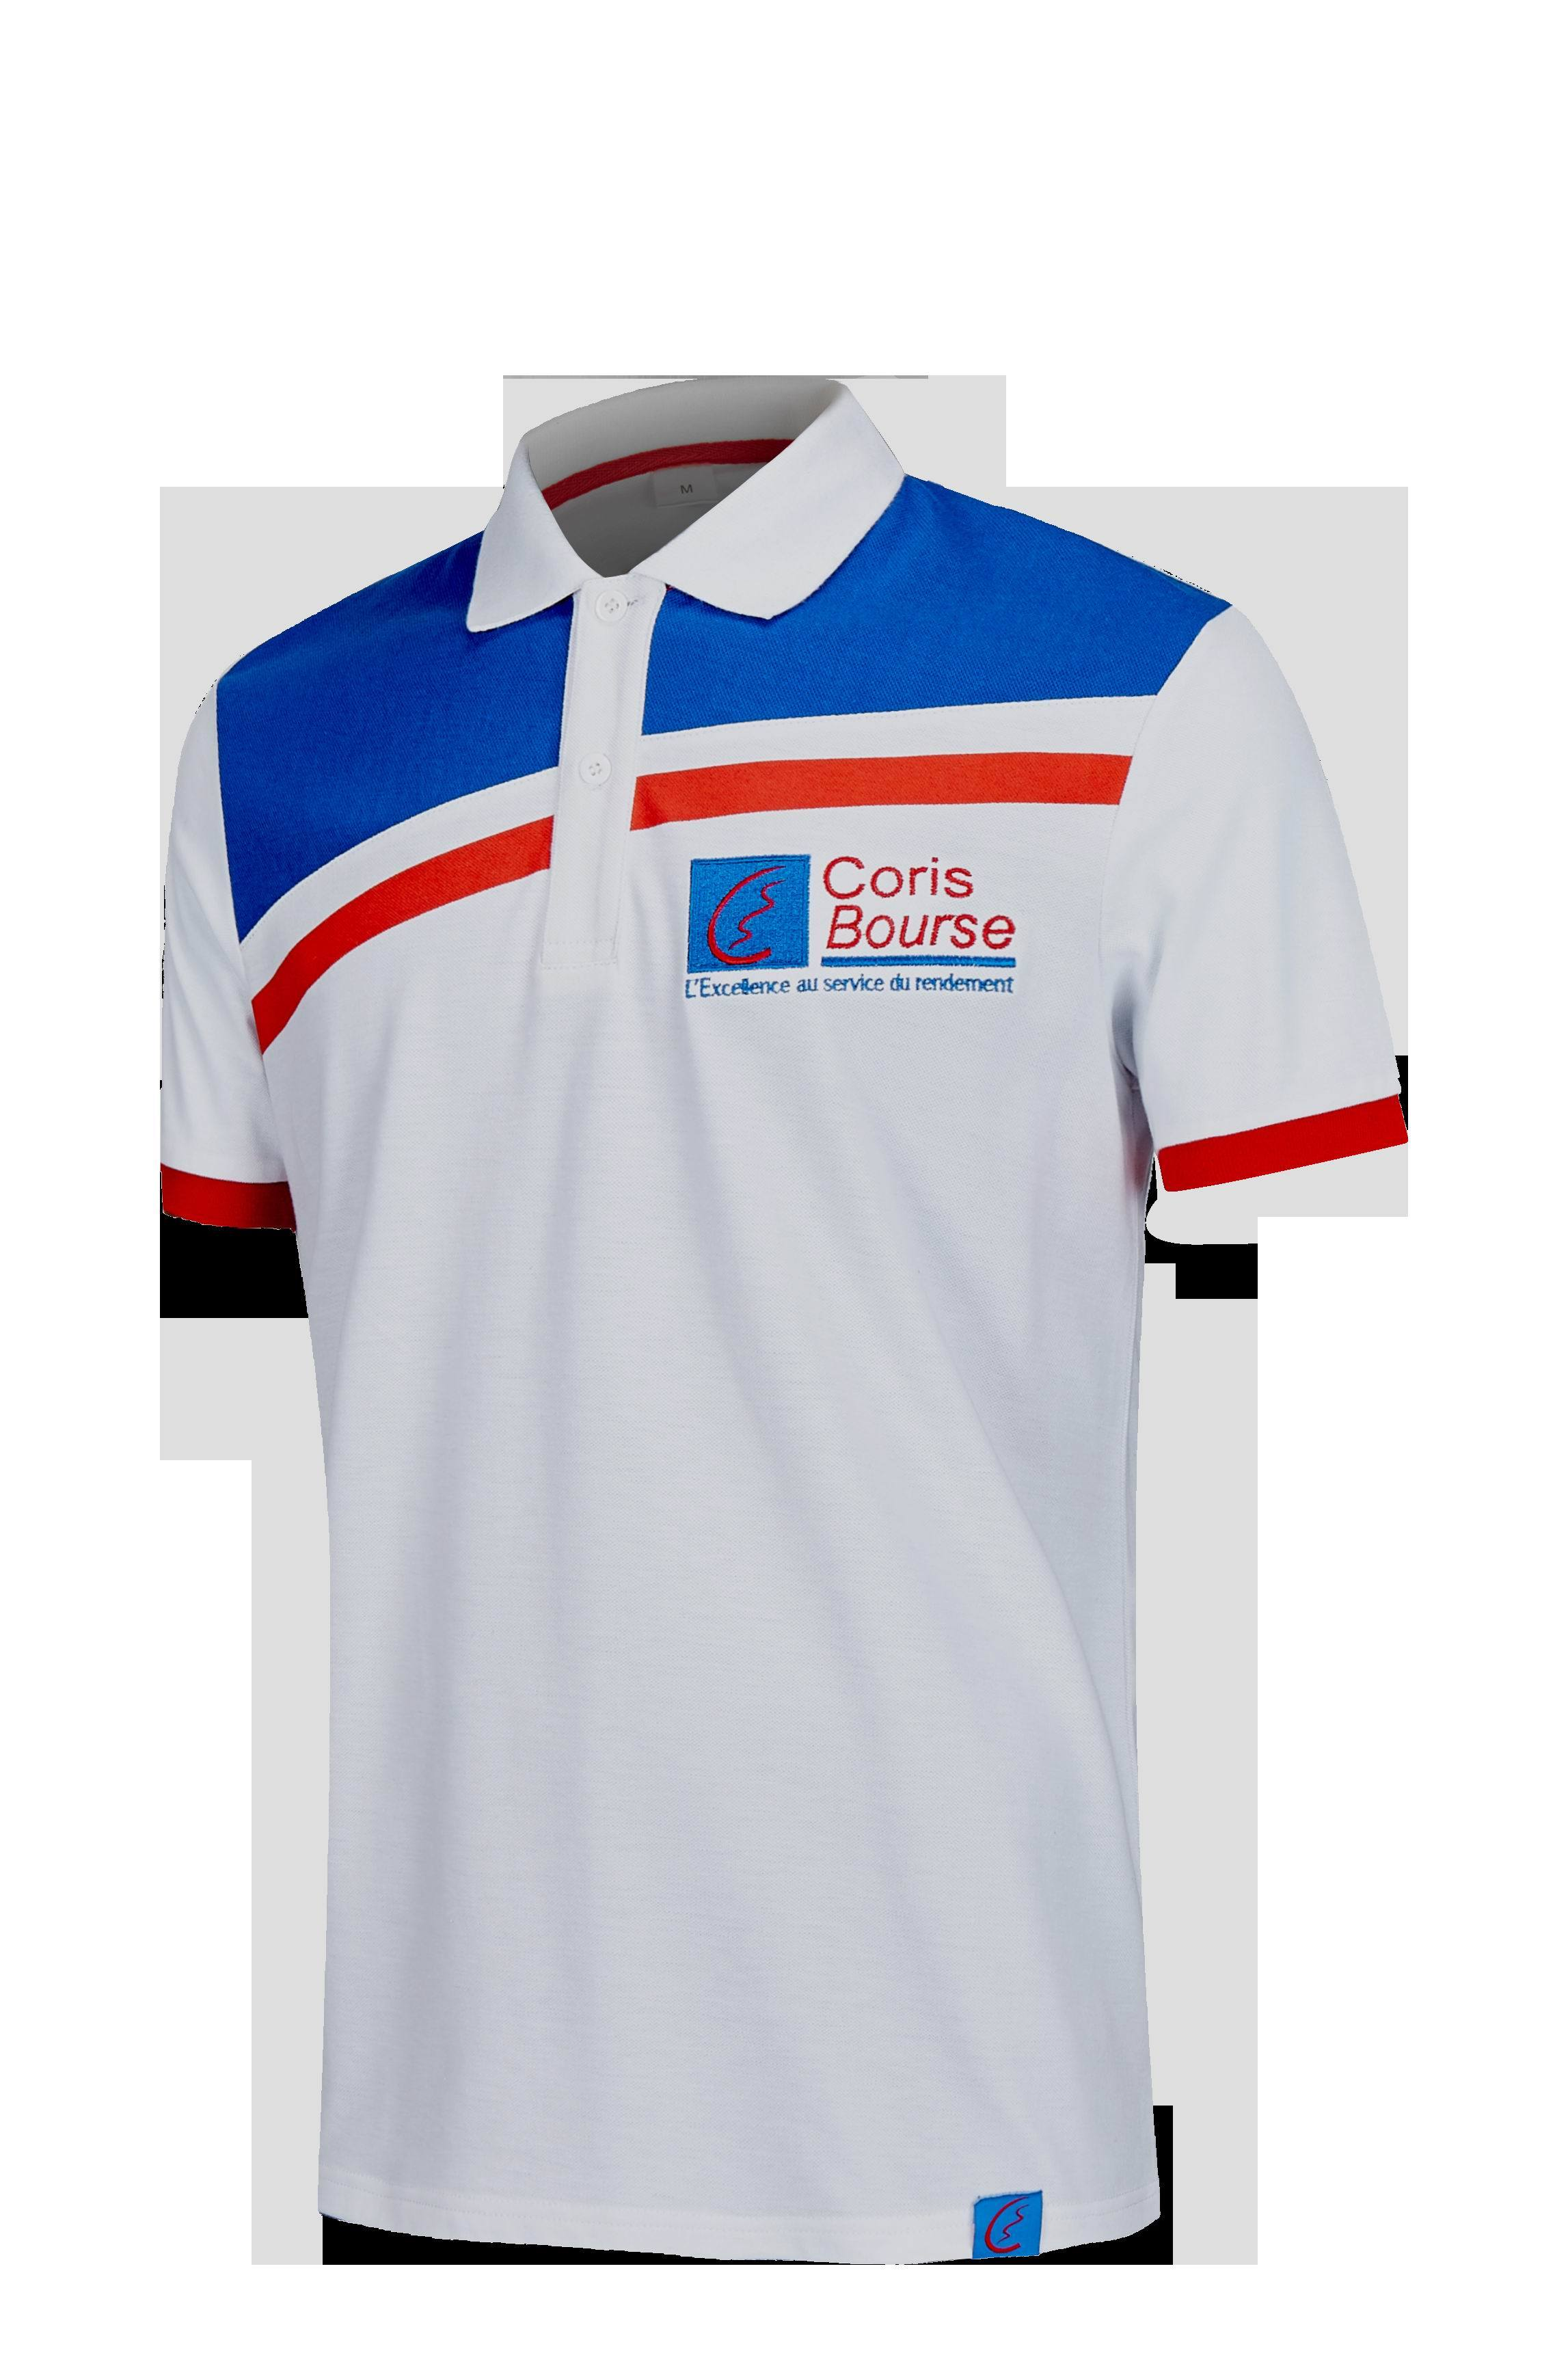 11d0da9d5 Company Uniform Polo Shirt Design | Kuenzi Turf & Nursery